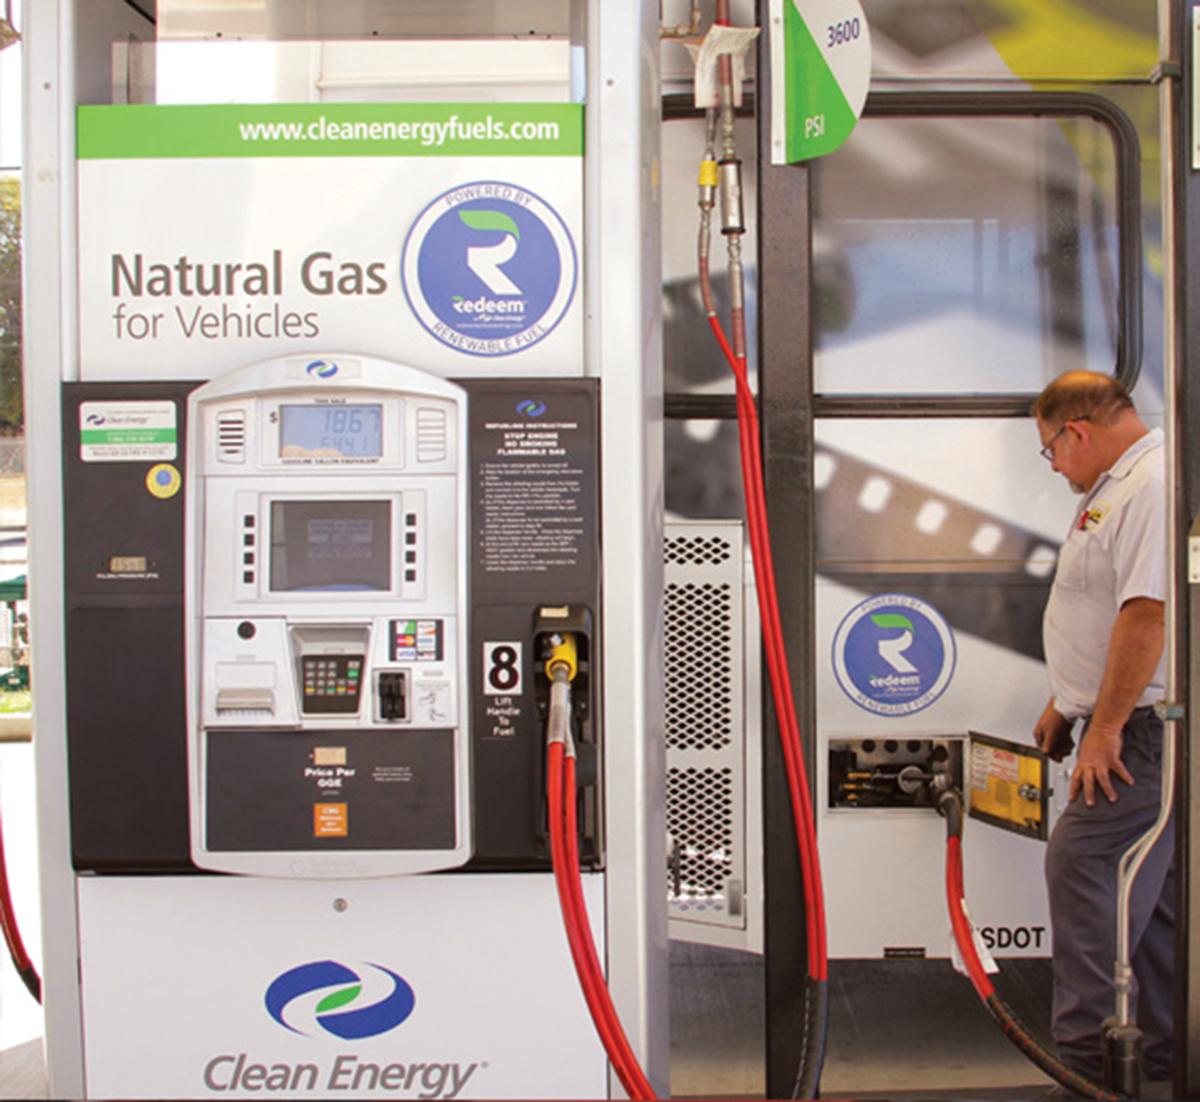 Technician pumps Redeem by Clean Energy Fuels